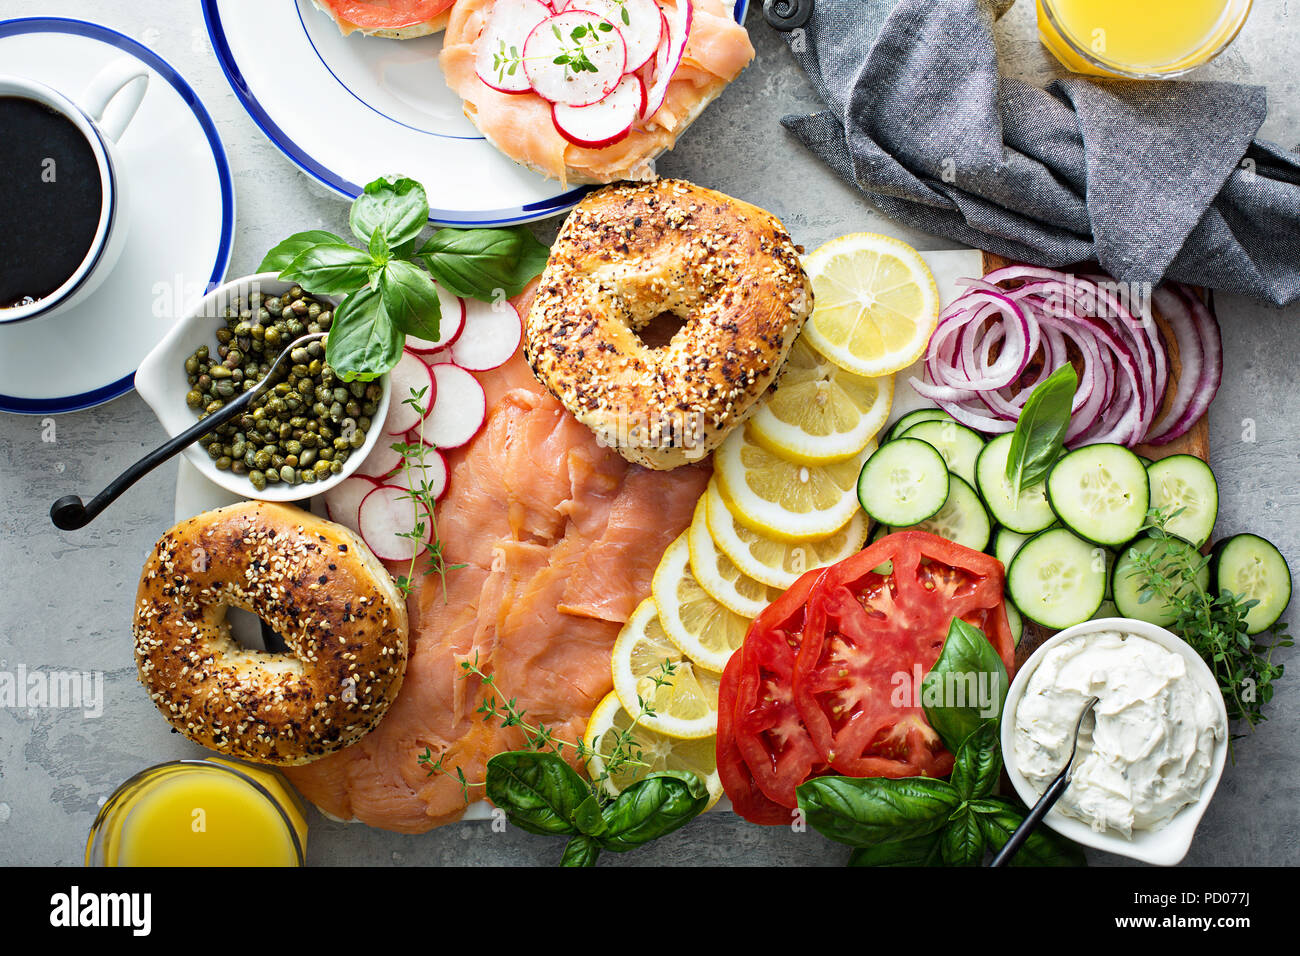 Bagels und lox Platter Stockbild